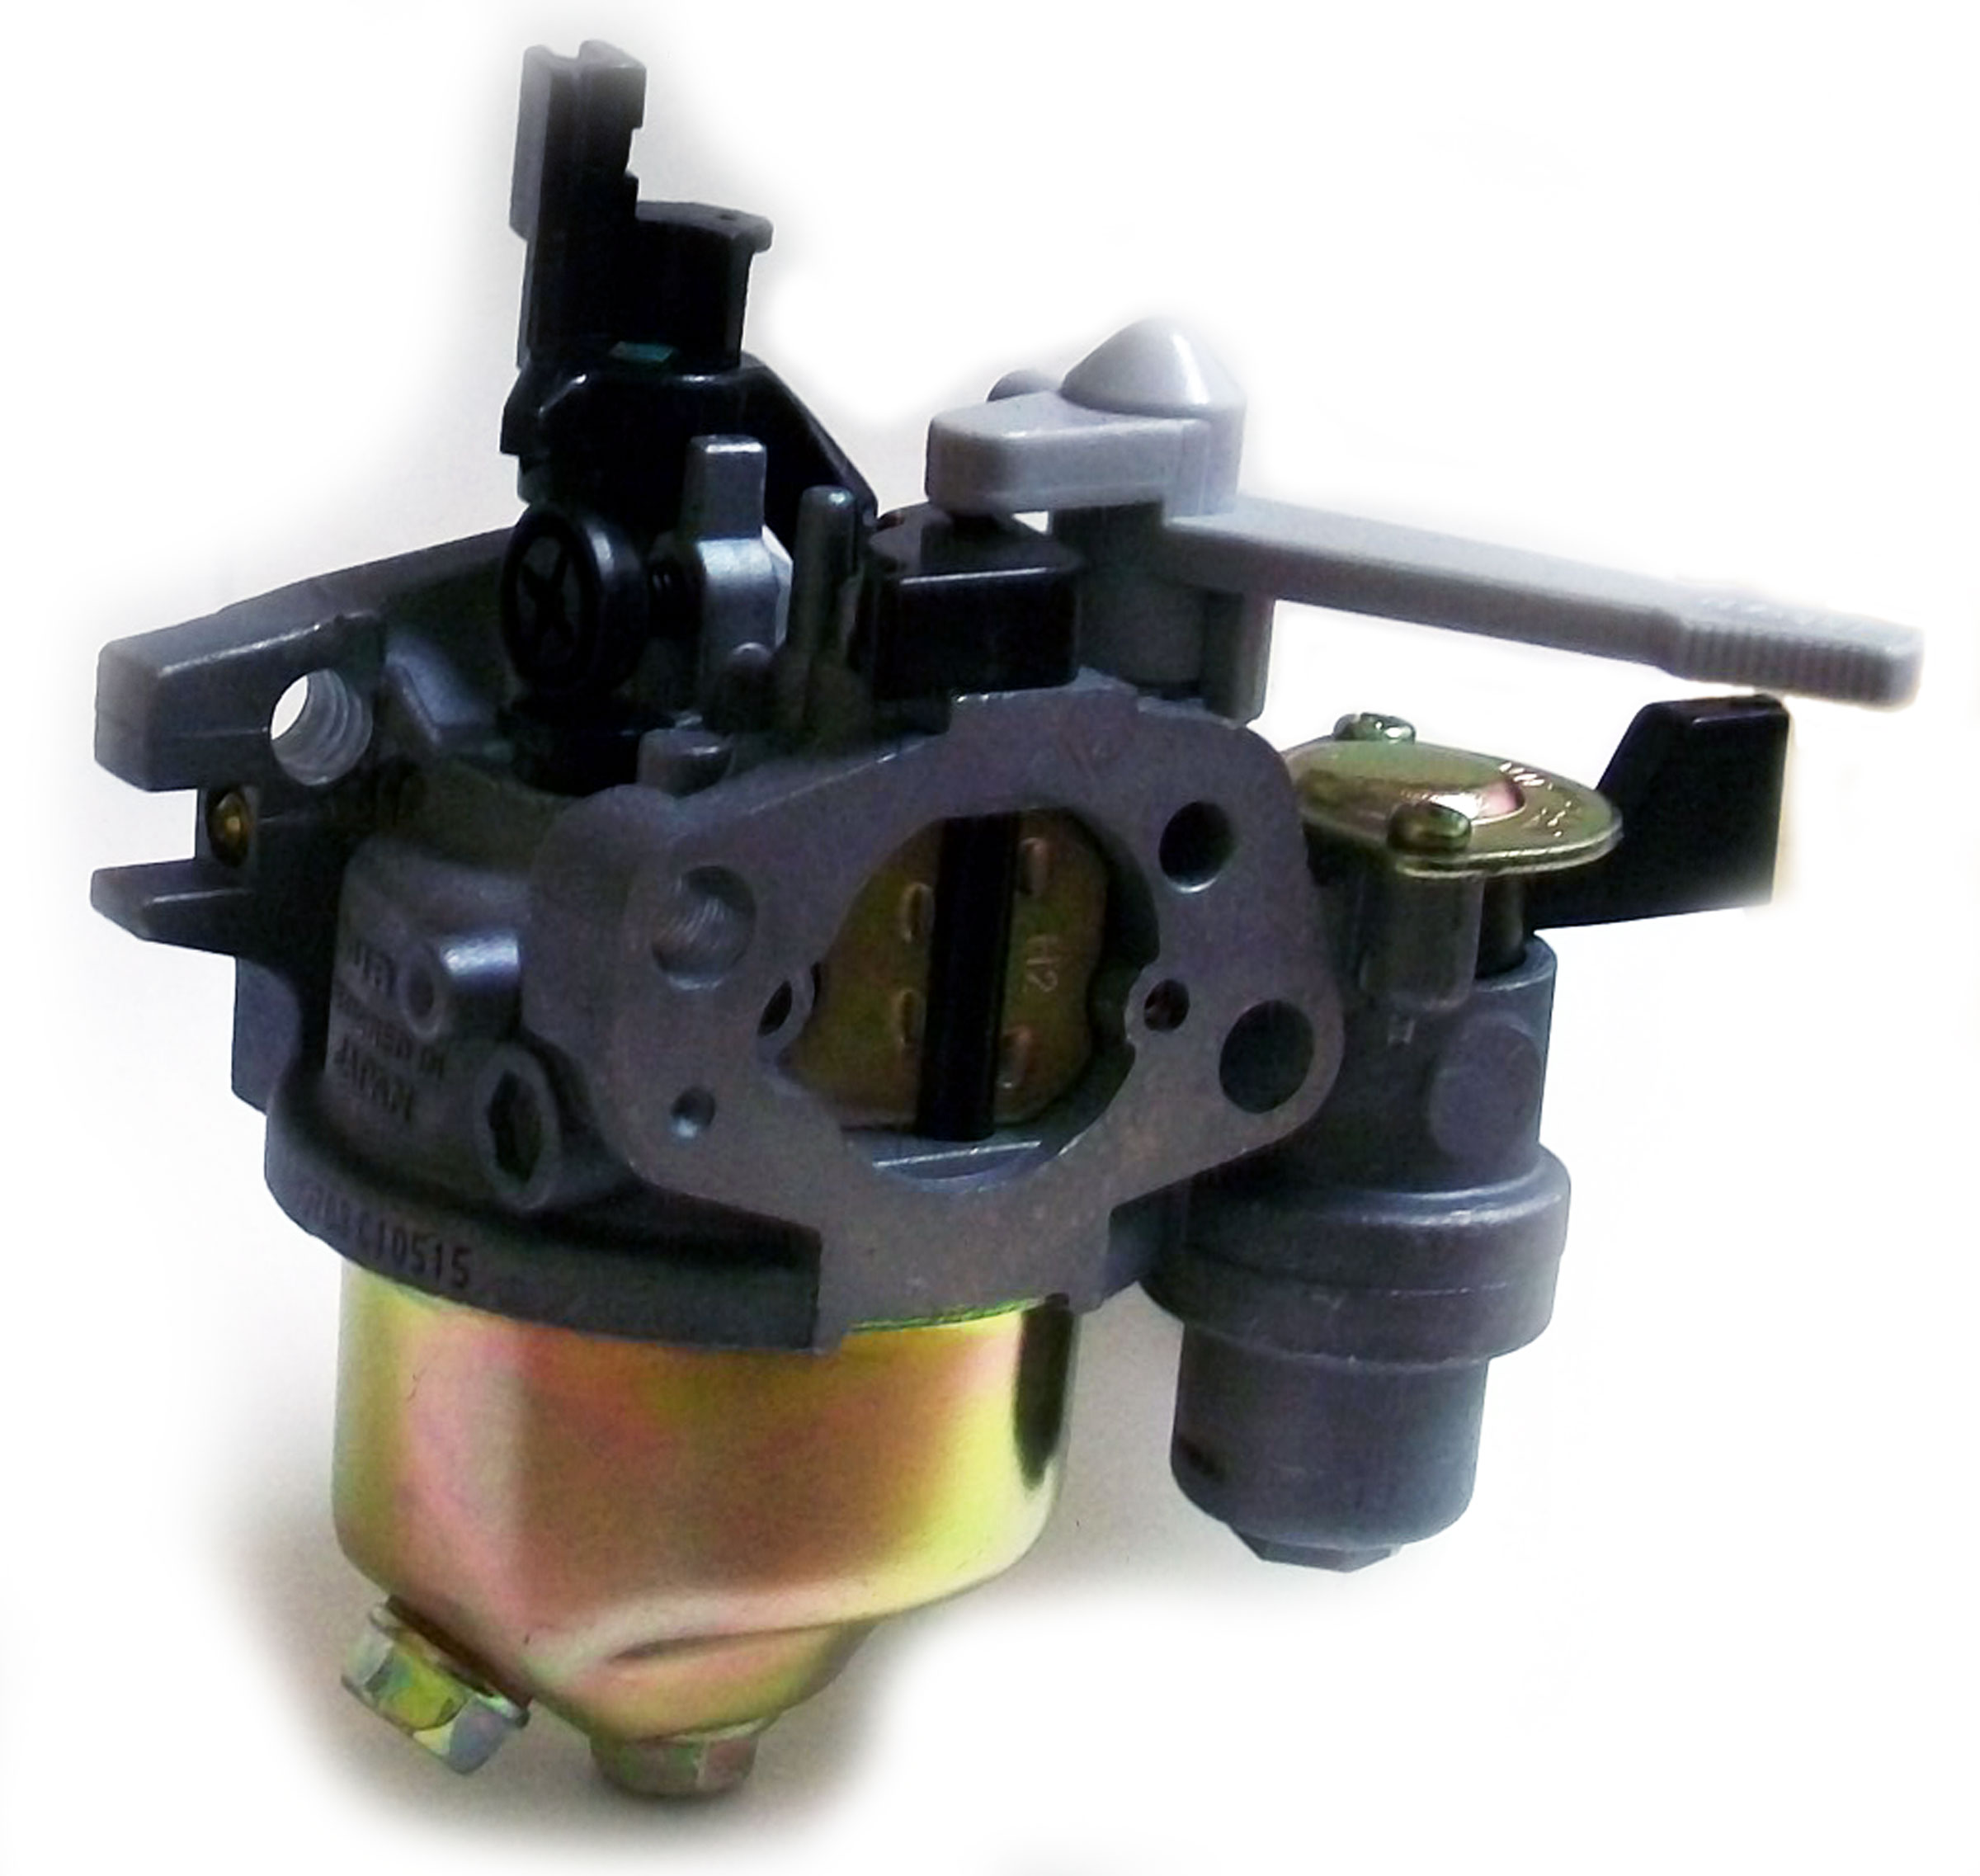 Carburetor by RuiXing for Honda GX200 6 5 HP Clone Engine | 711225 | BMI  Karts And Parts